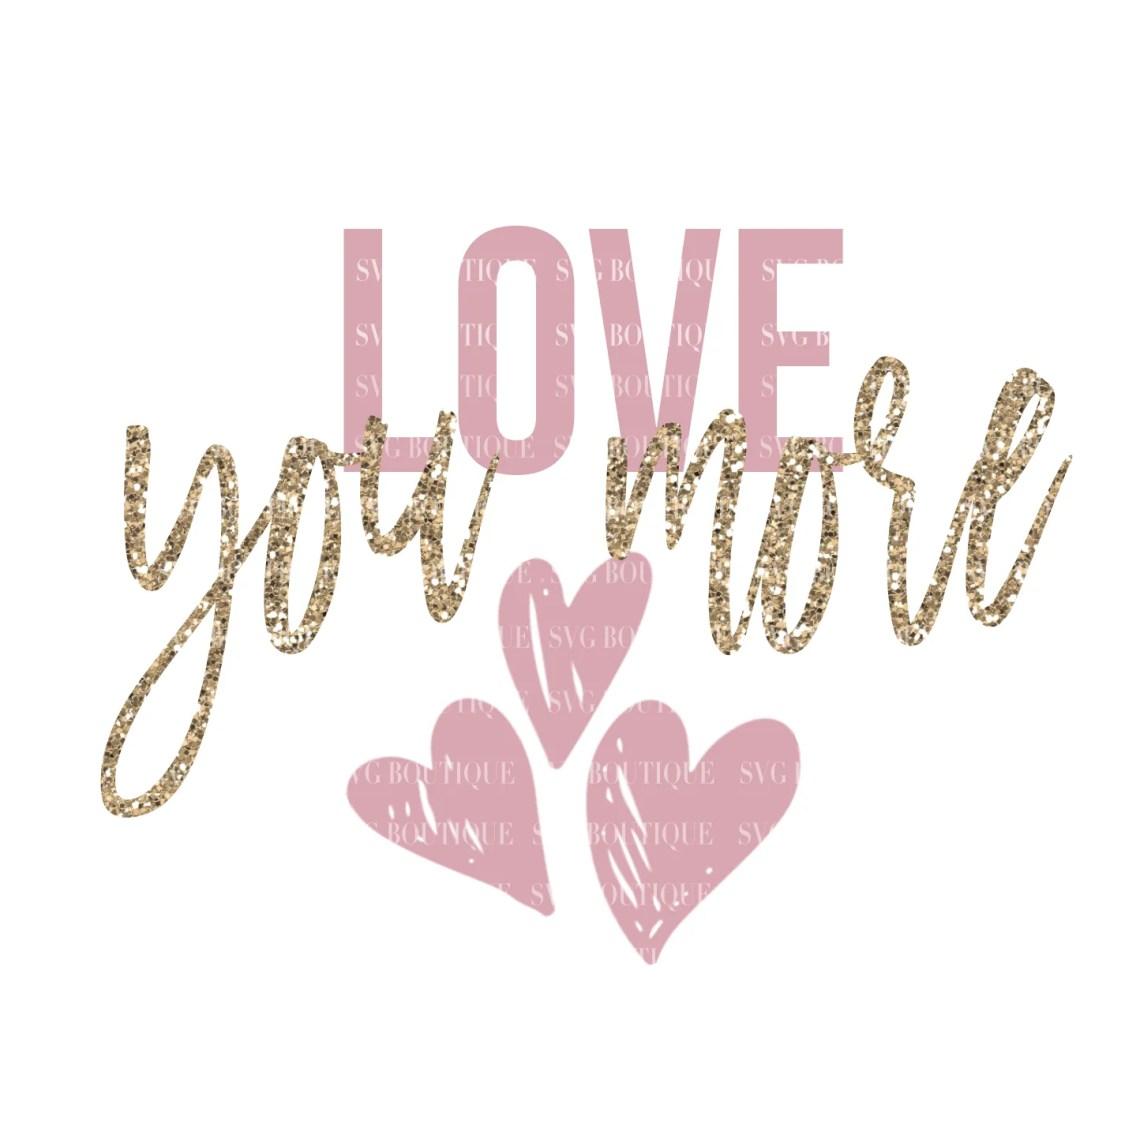 Download Love You More Valentine's Day SVG File - SVG BOUTIQUE